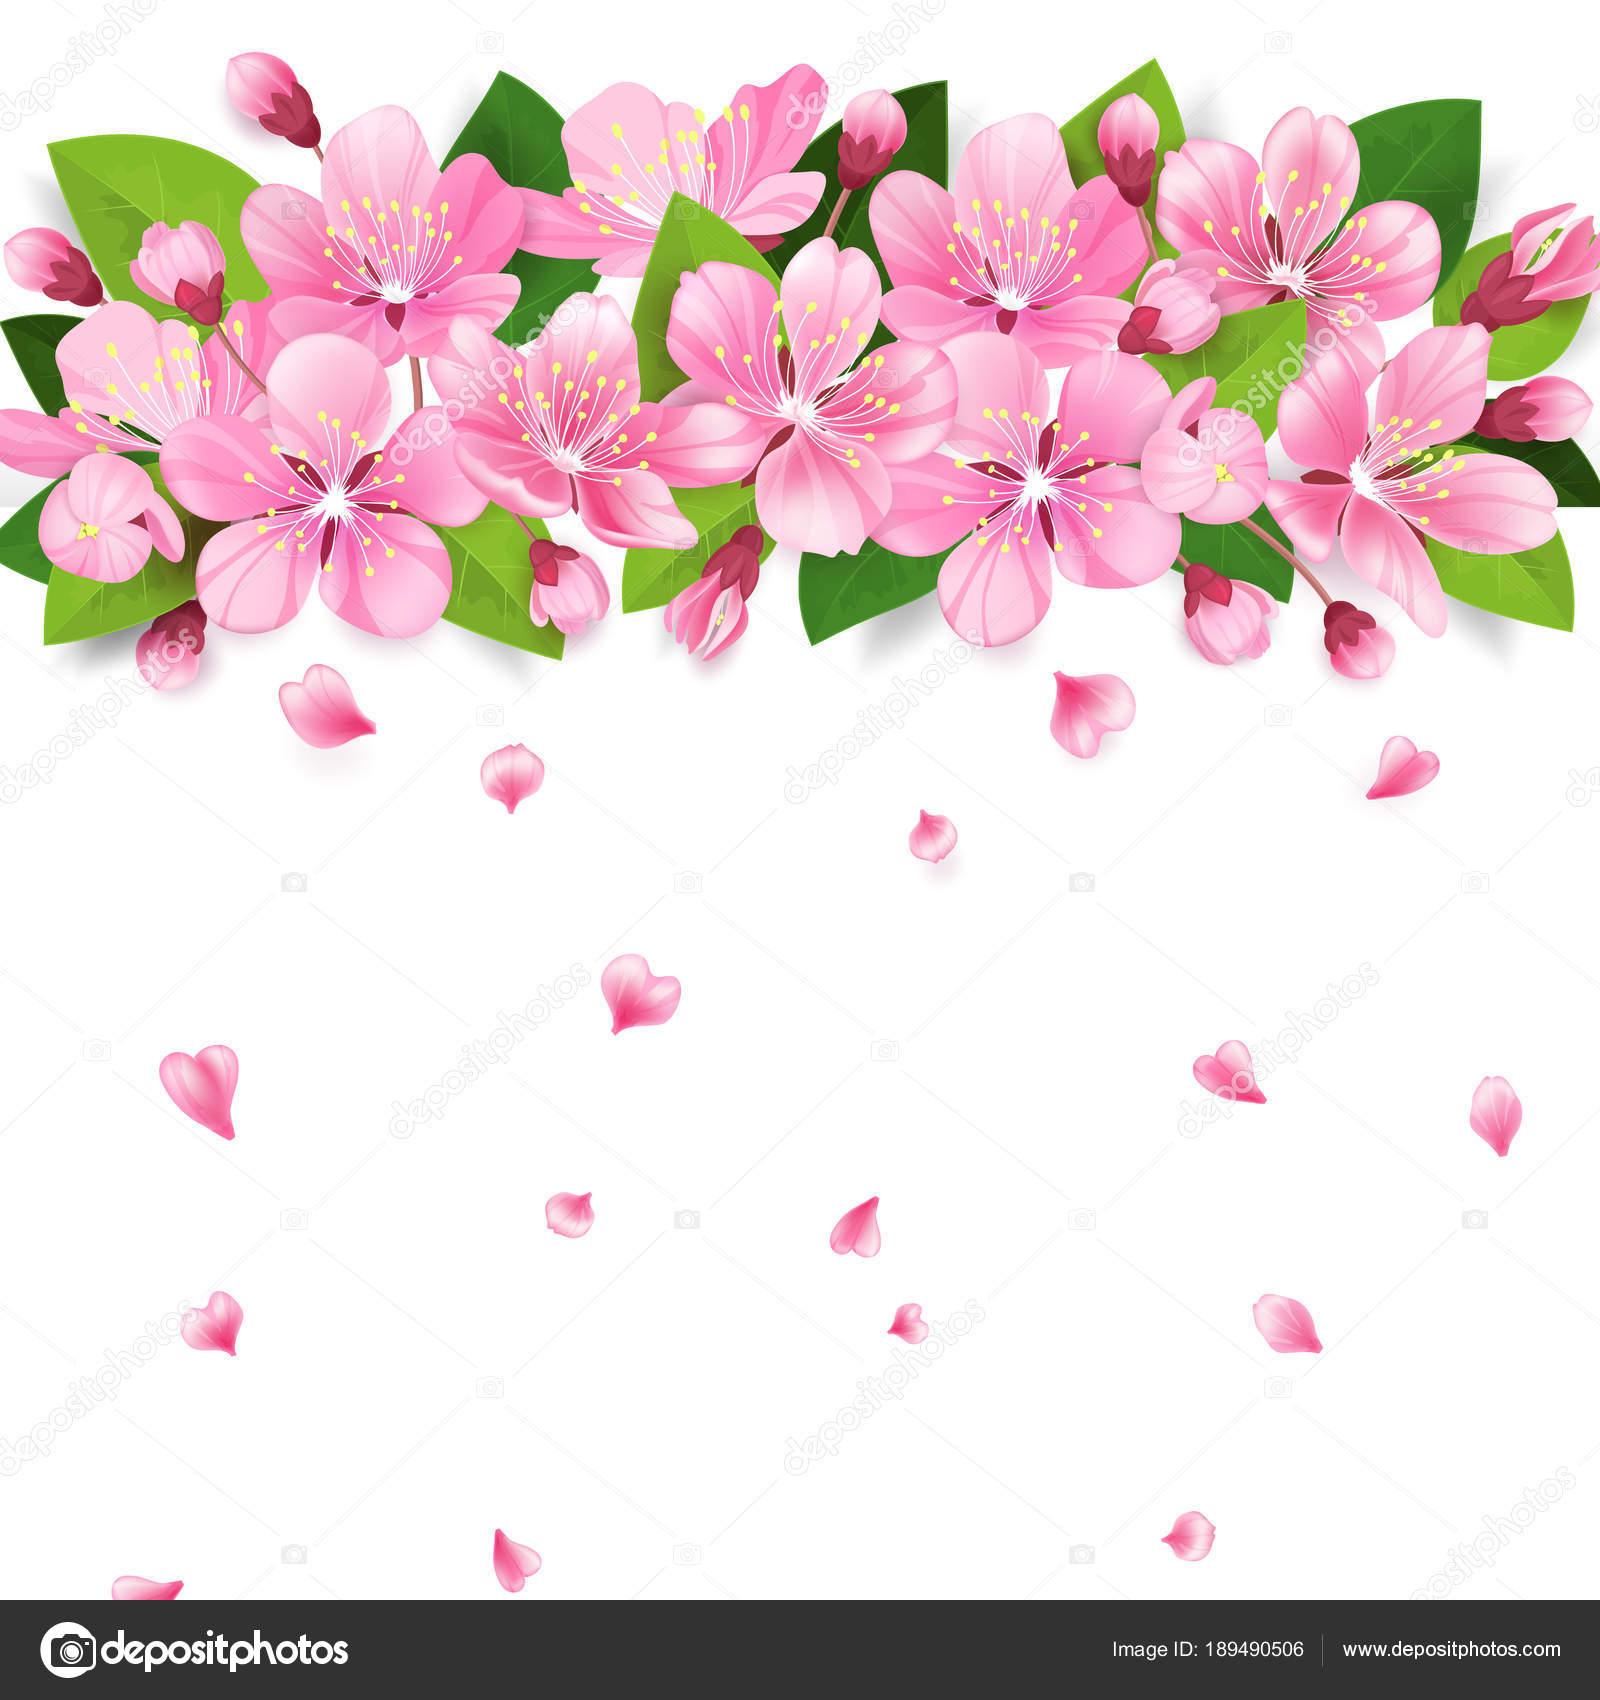 Realistic sakura japan cherry or apple tree branch with blooming realistic sakura japan cherry or apple tree branch with blooming flowers pink flowers border with mightylinksfo